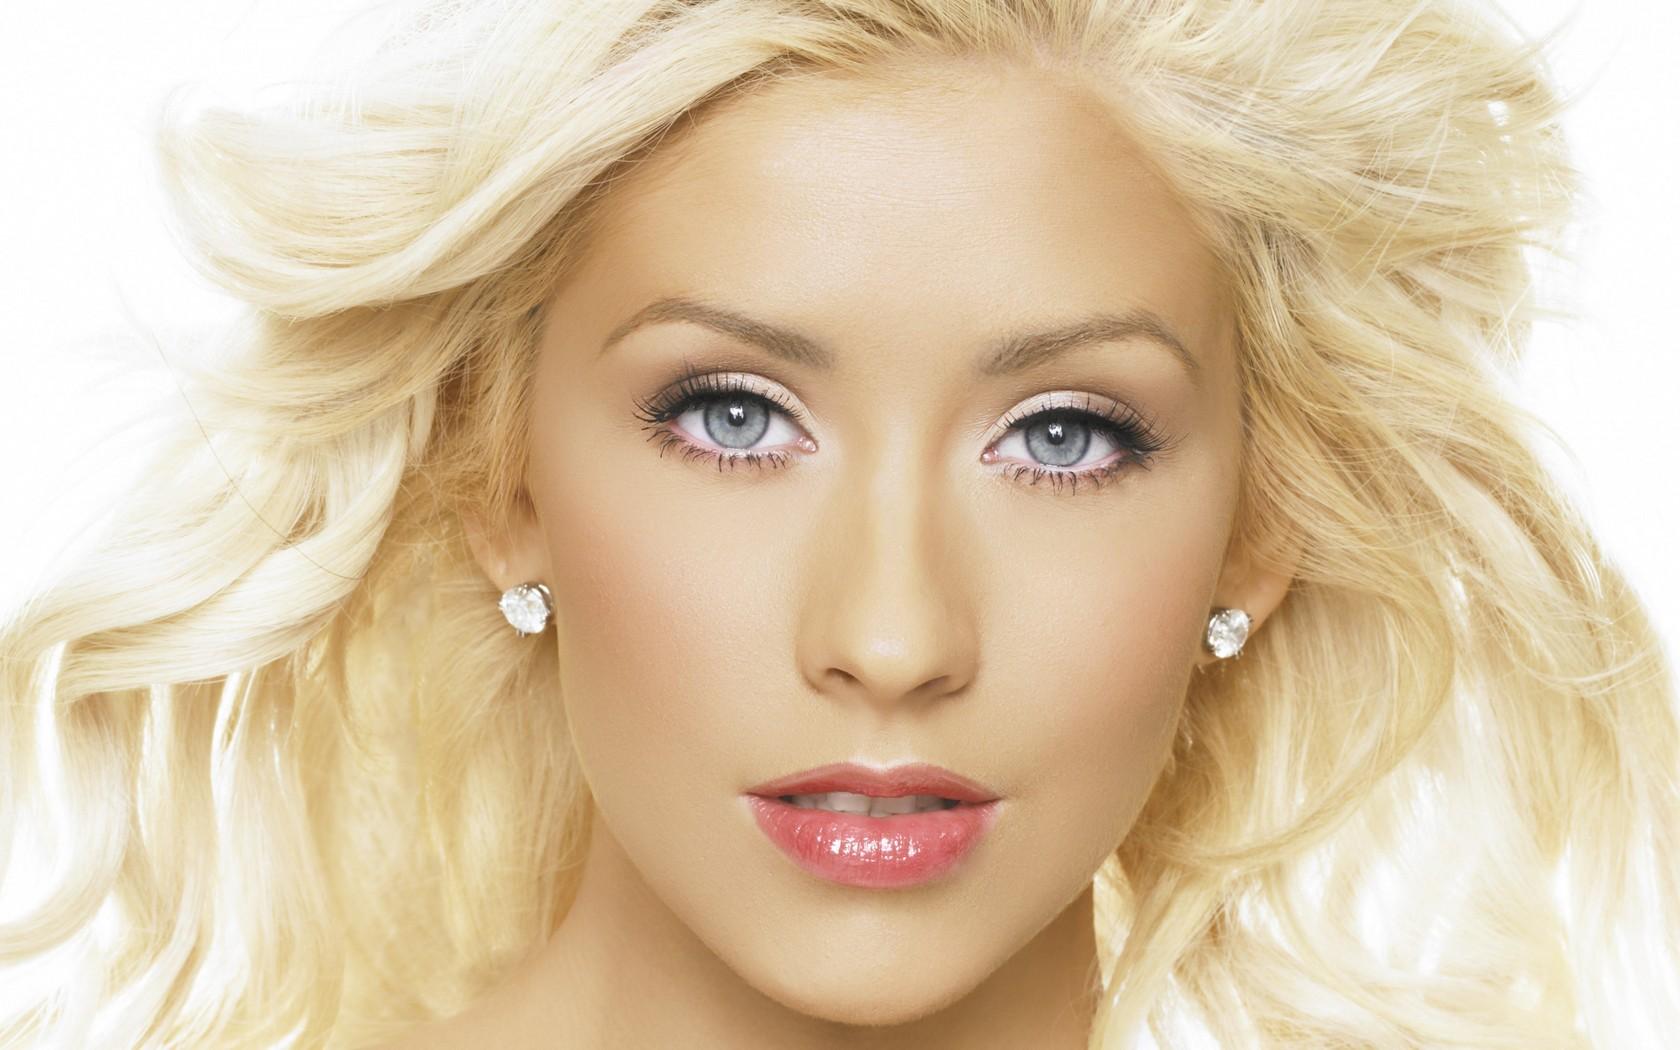 Christina Aguilera Celebrities Female wallpaper